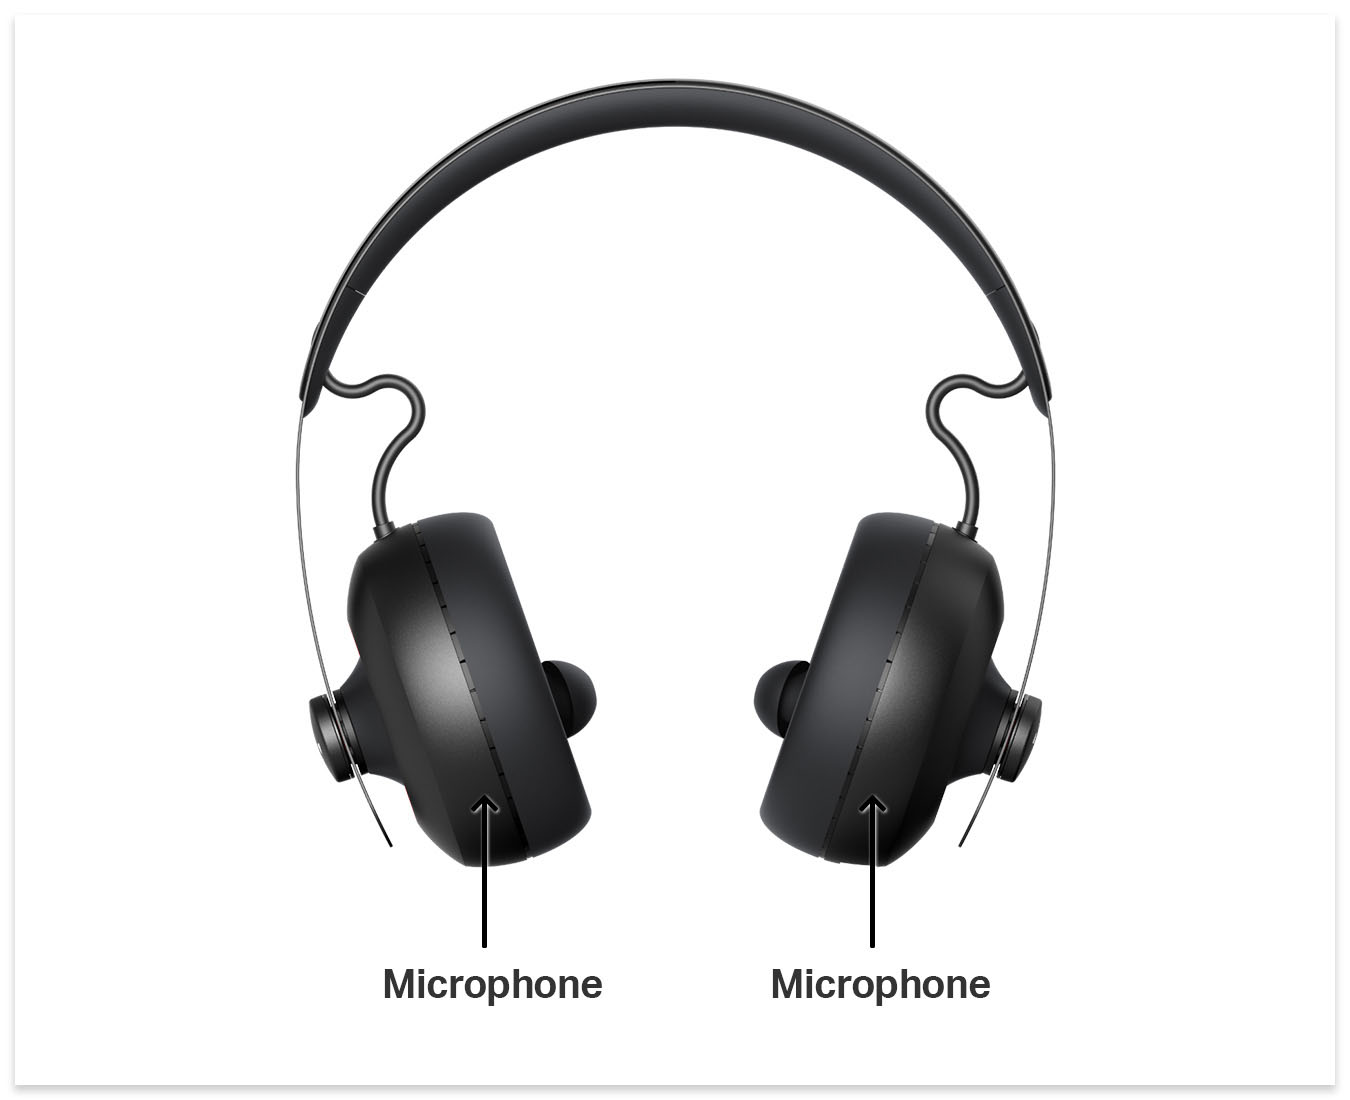 VoiceCallsMicrophones.jpg